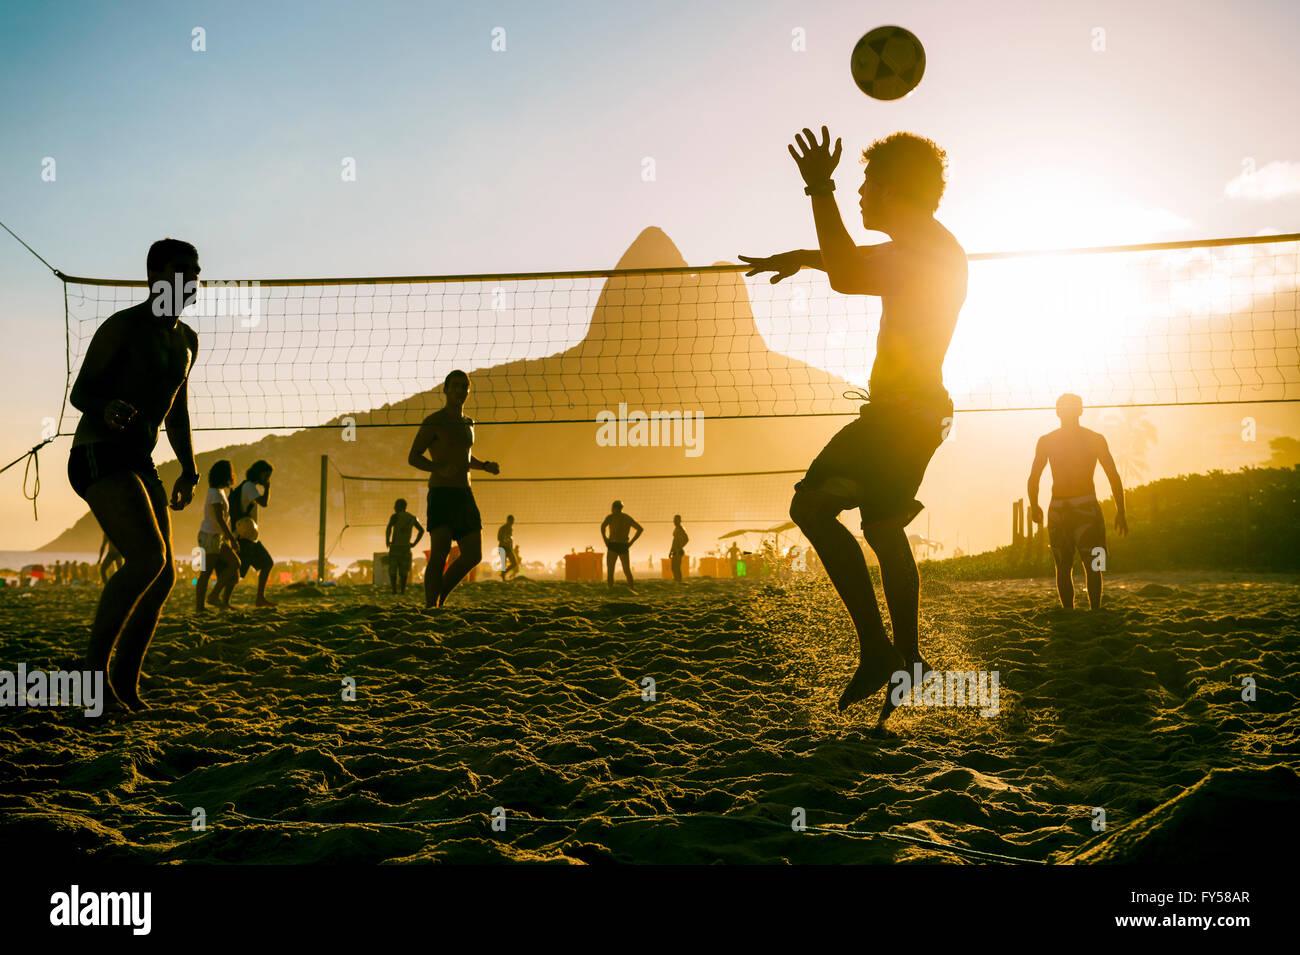 RIO DE JANEIRO - 27. März 2016: Brasilianer spielen Strand Futevolei (Footvolley), Verbindung Fußball Stockbild